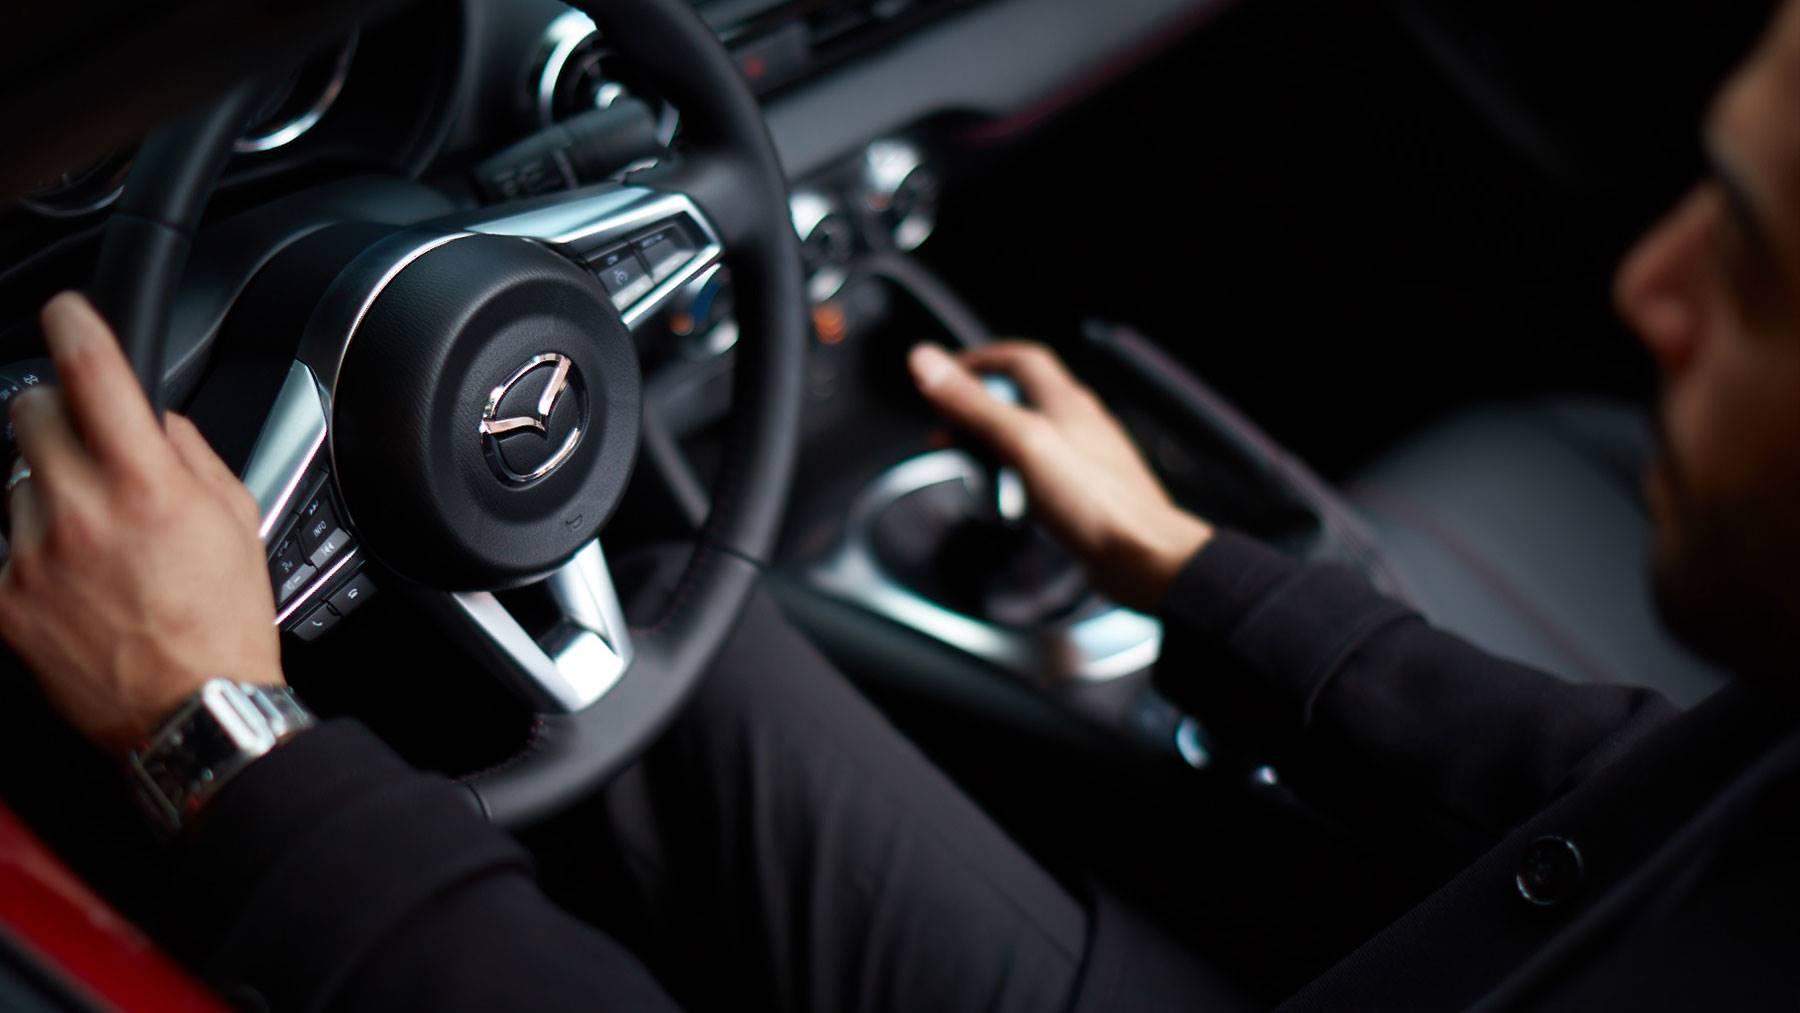 2018 Mazda Mx 5 Miata Rf Leasing In Sacramento Ca Maita Emission Wiring Harness 2001 Interior